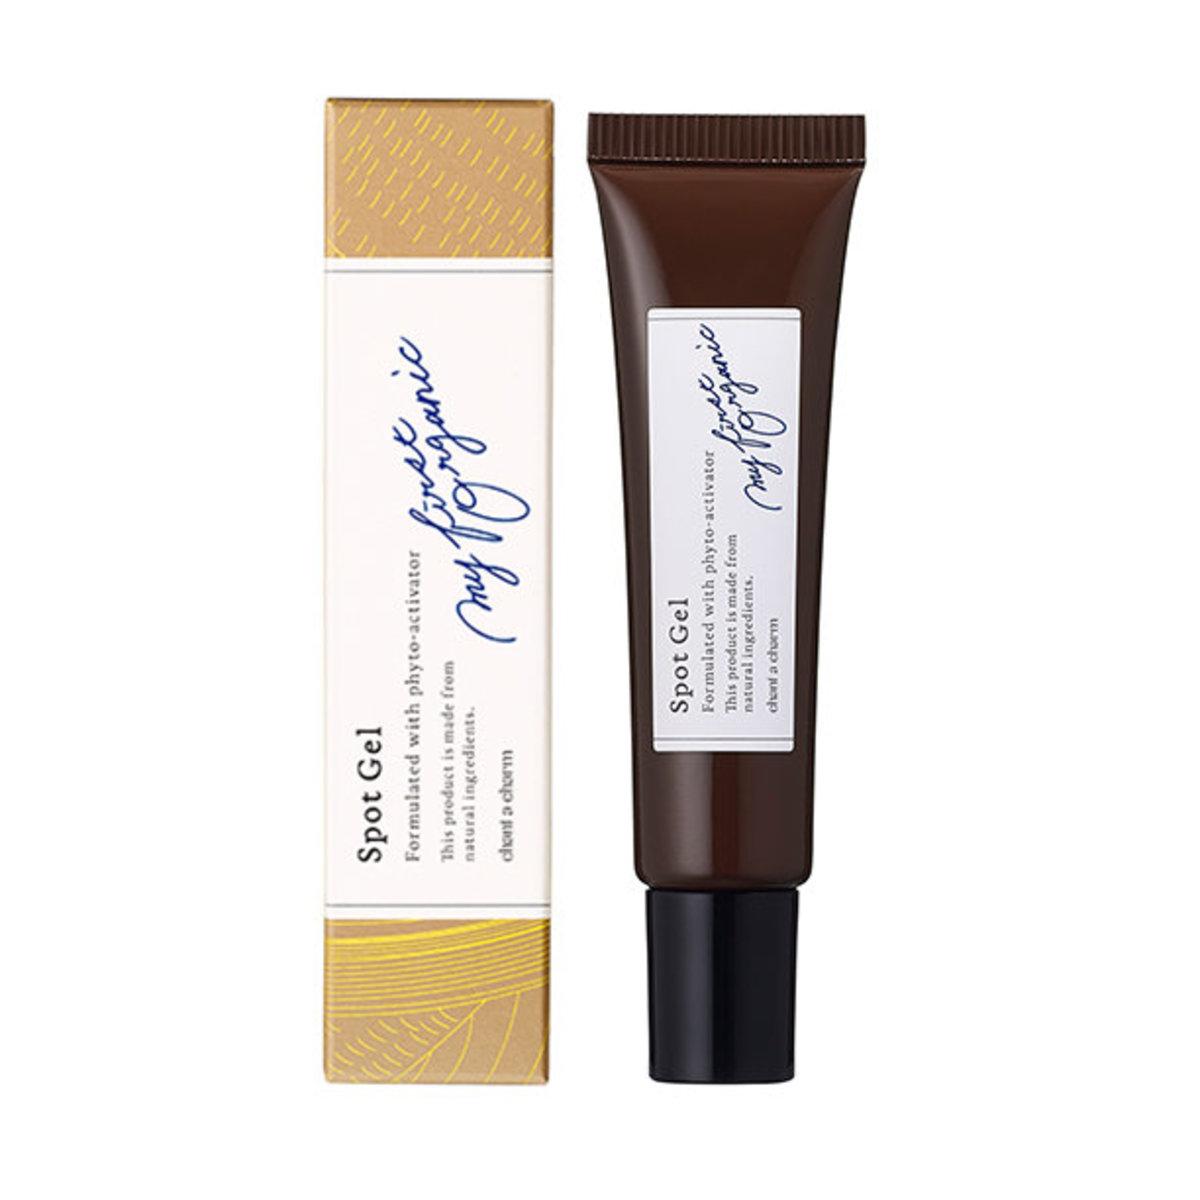 (JAPAN) Spot Gel 15ml - Organic Skincare Brand [Authorized product]